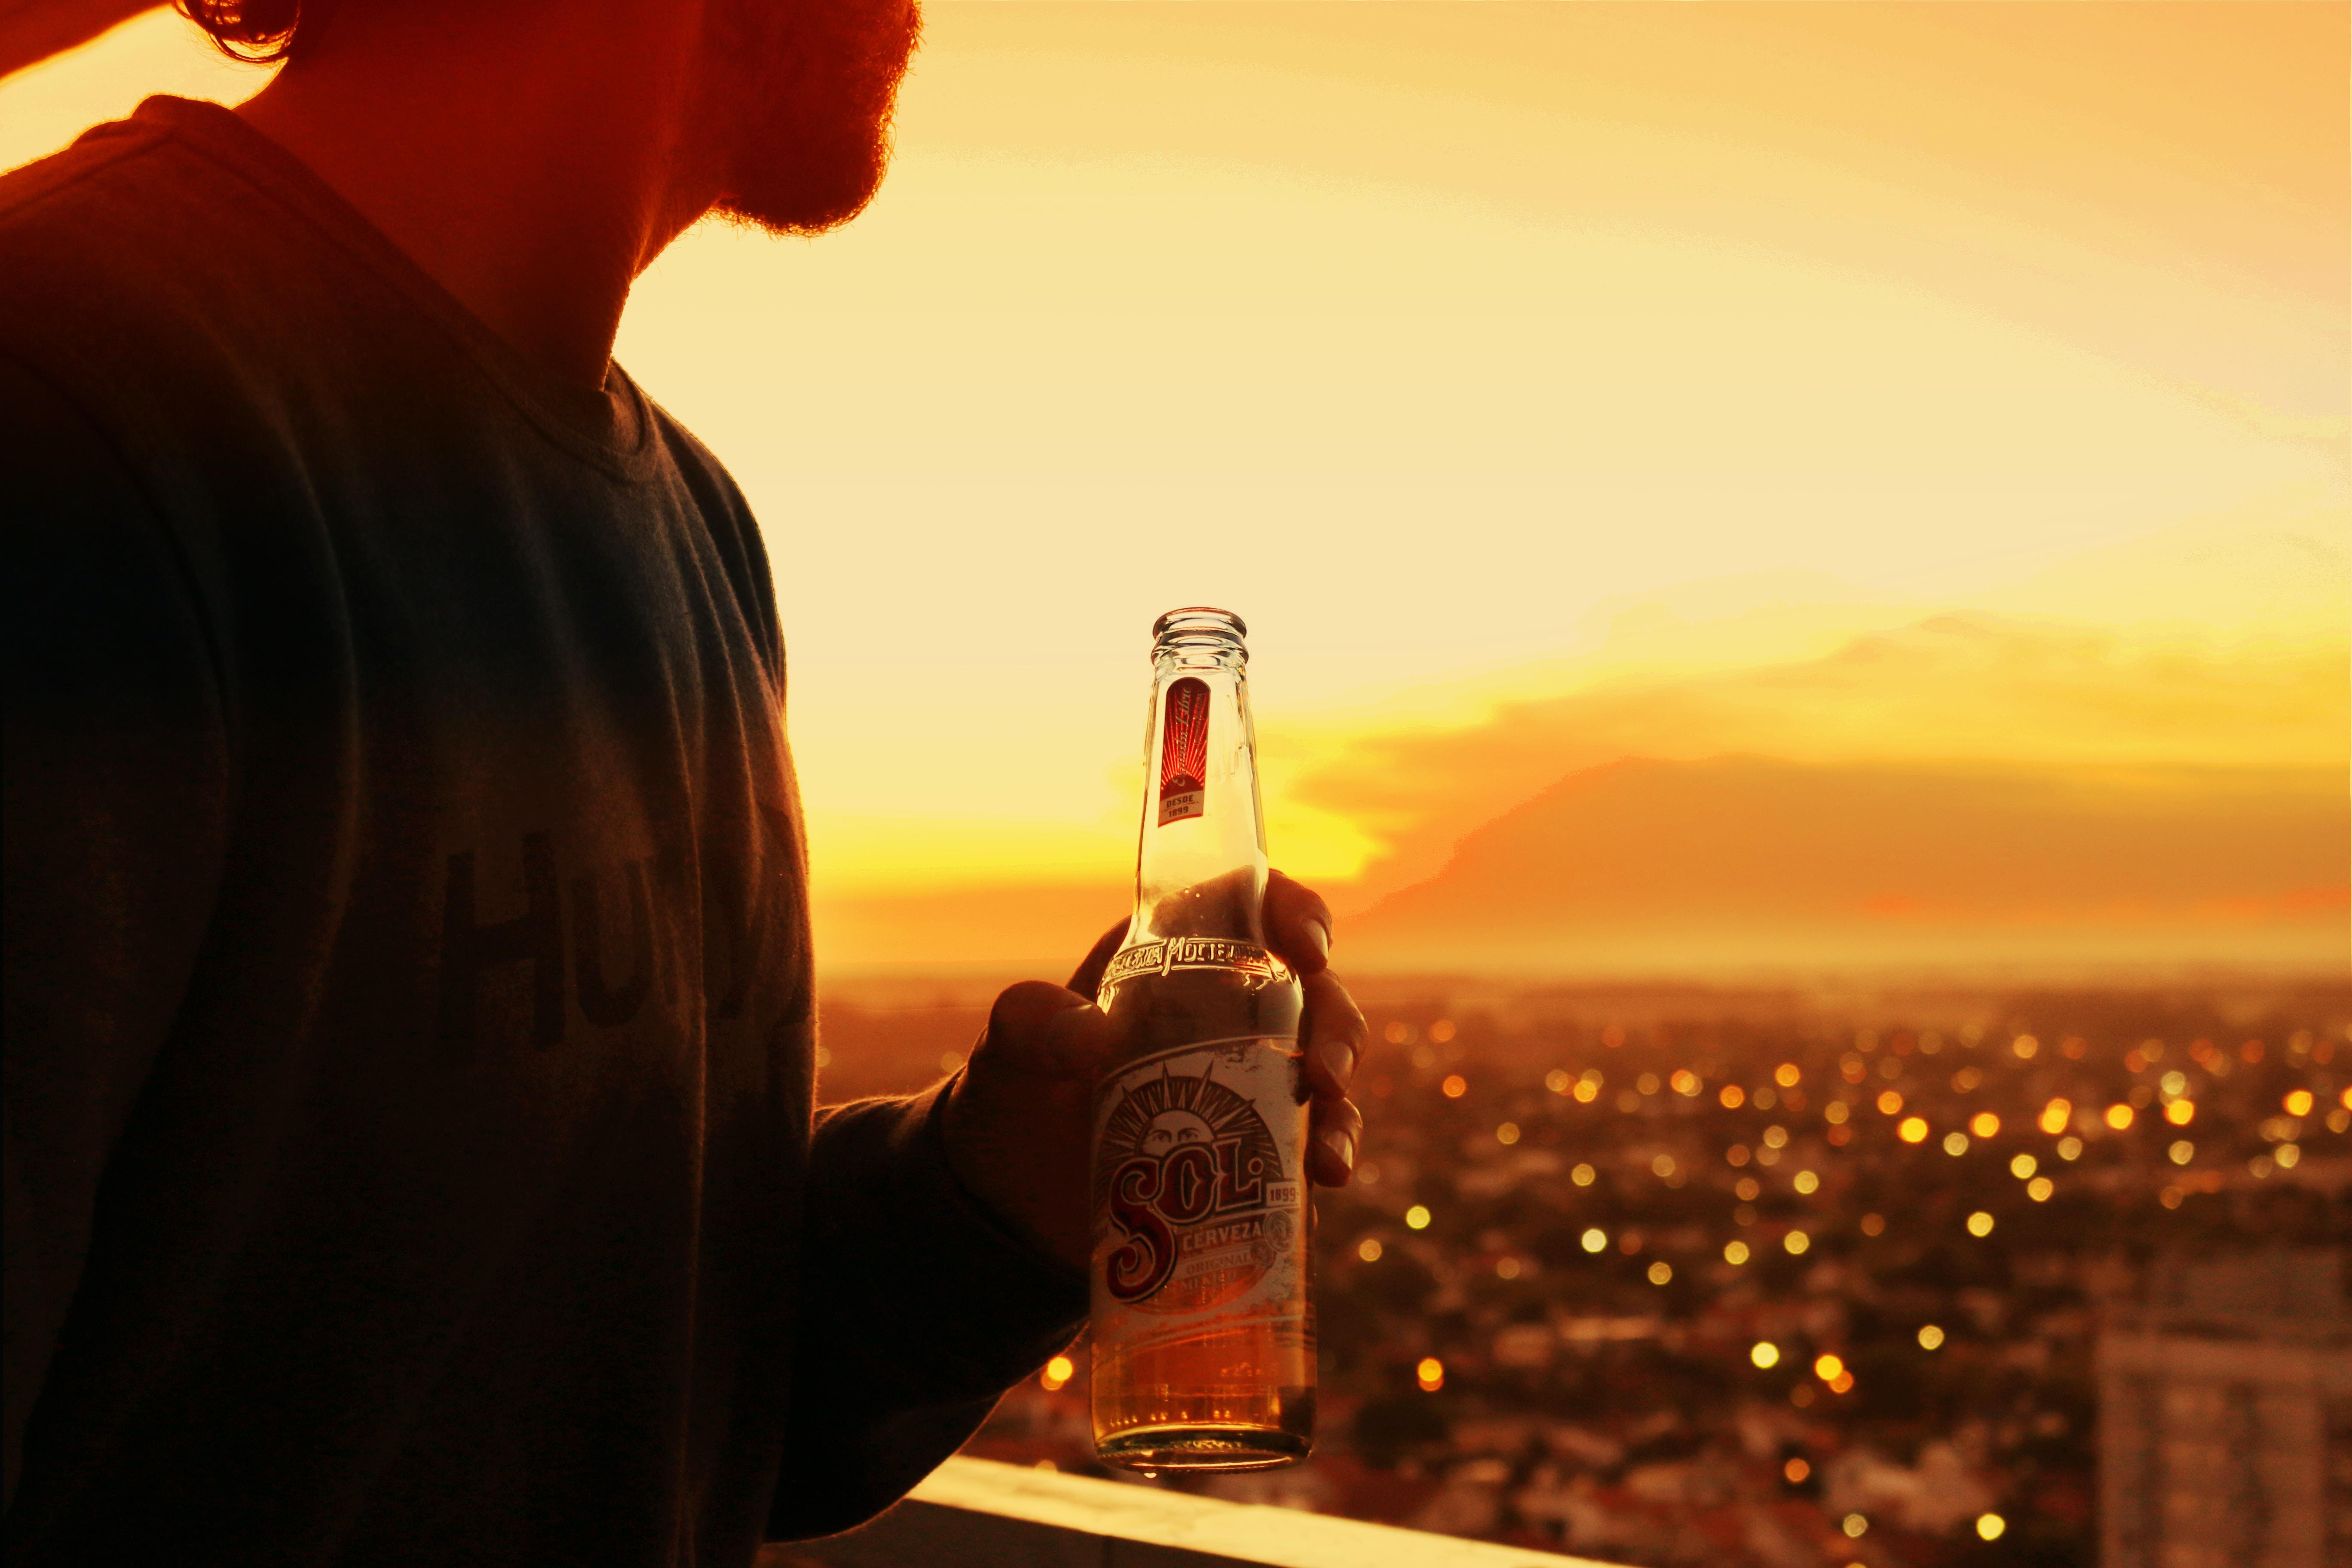 man holding bottle near buildings